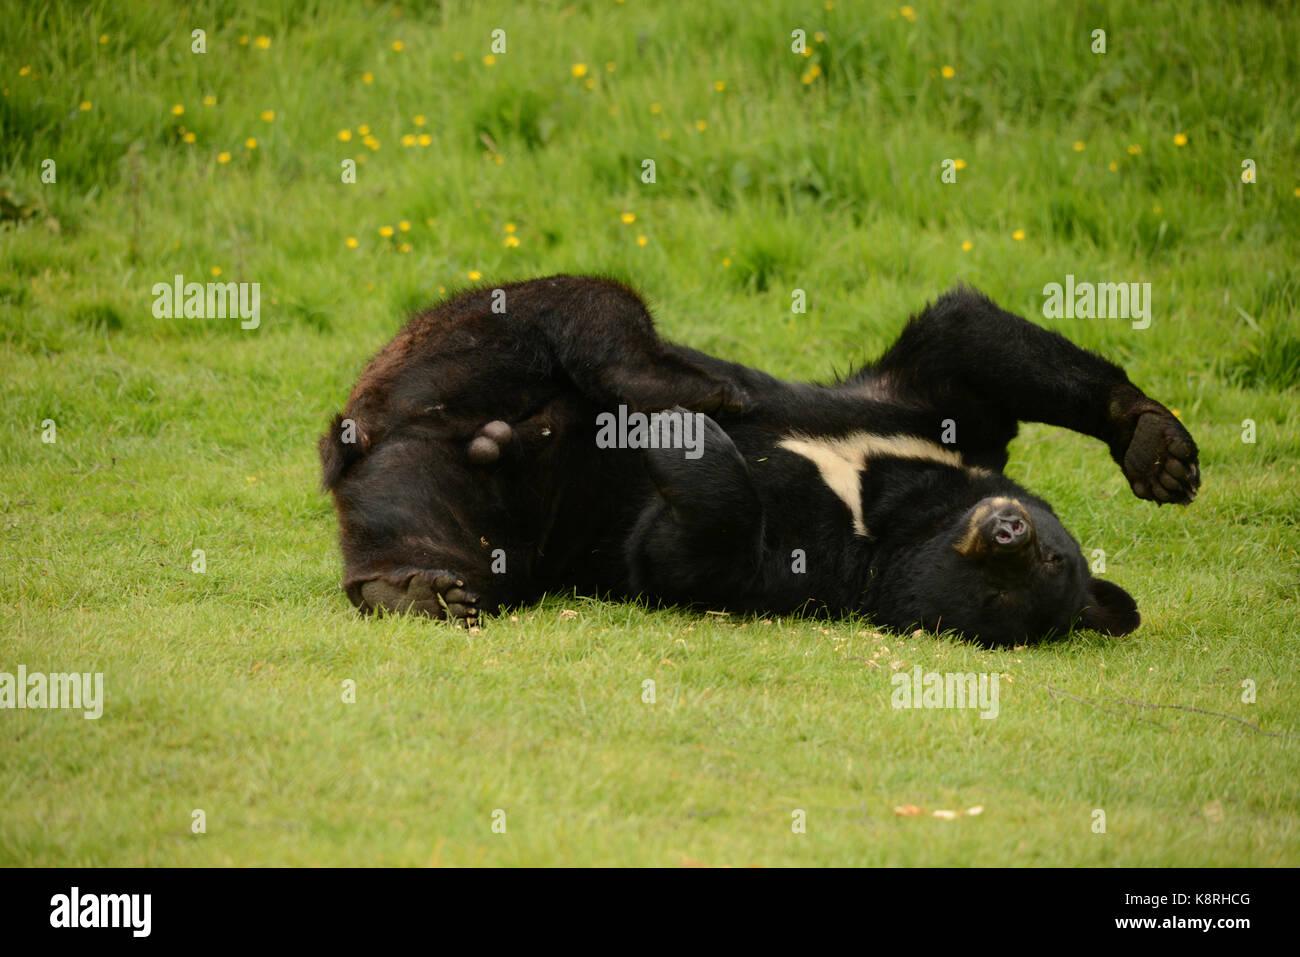 Brown bear - Stock Image